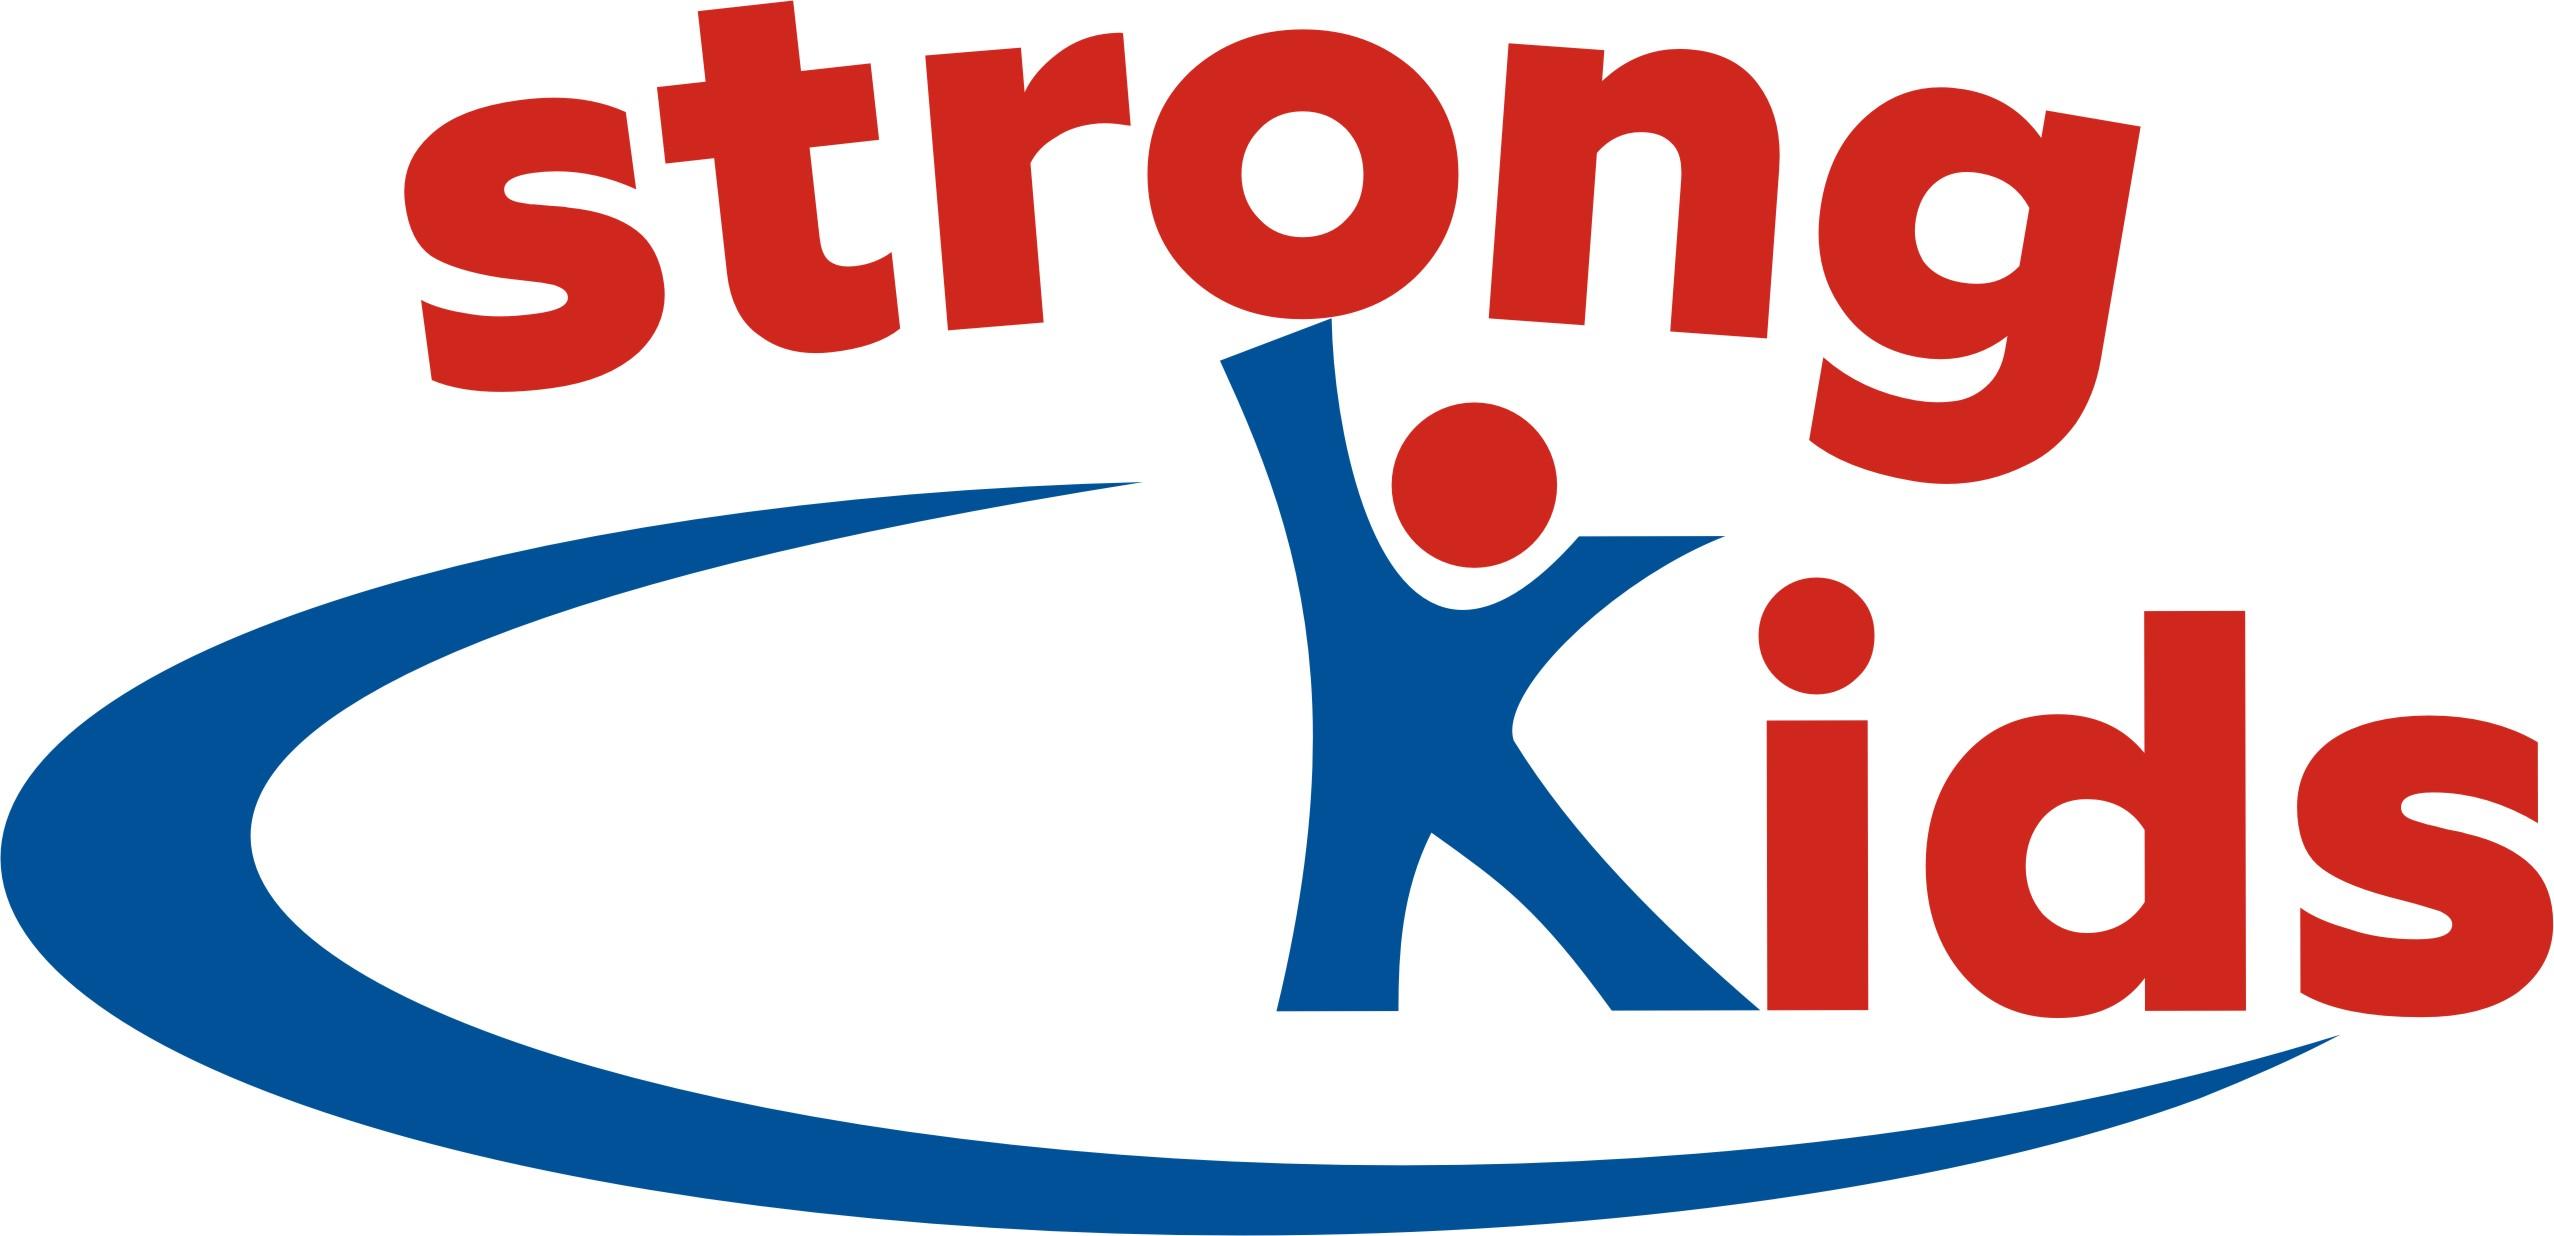 Логотип для Детского Интернет Магазина StrongKids фото f_3735c88f111e79b8.jpg